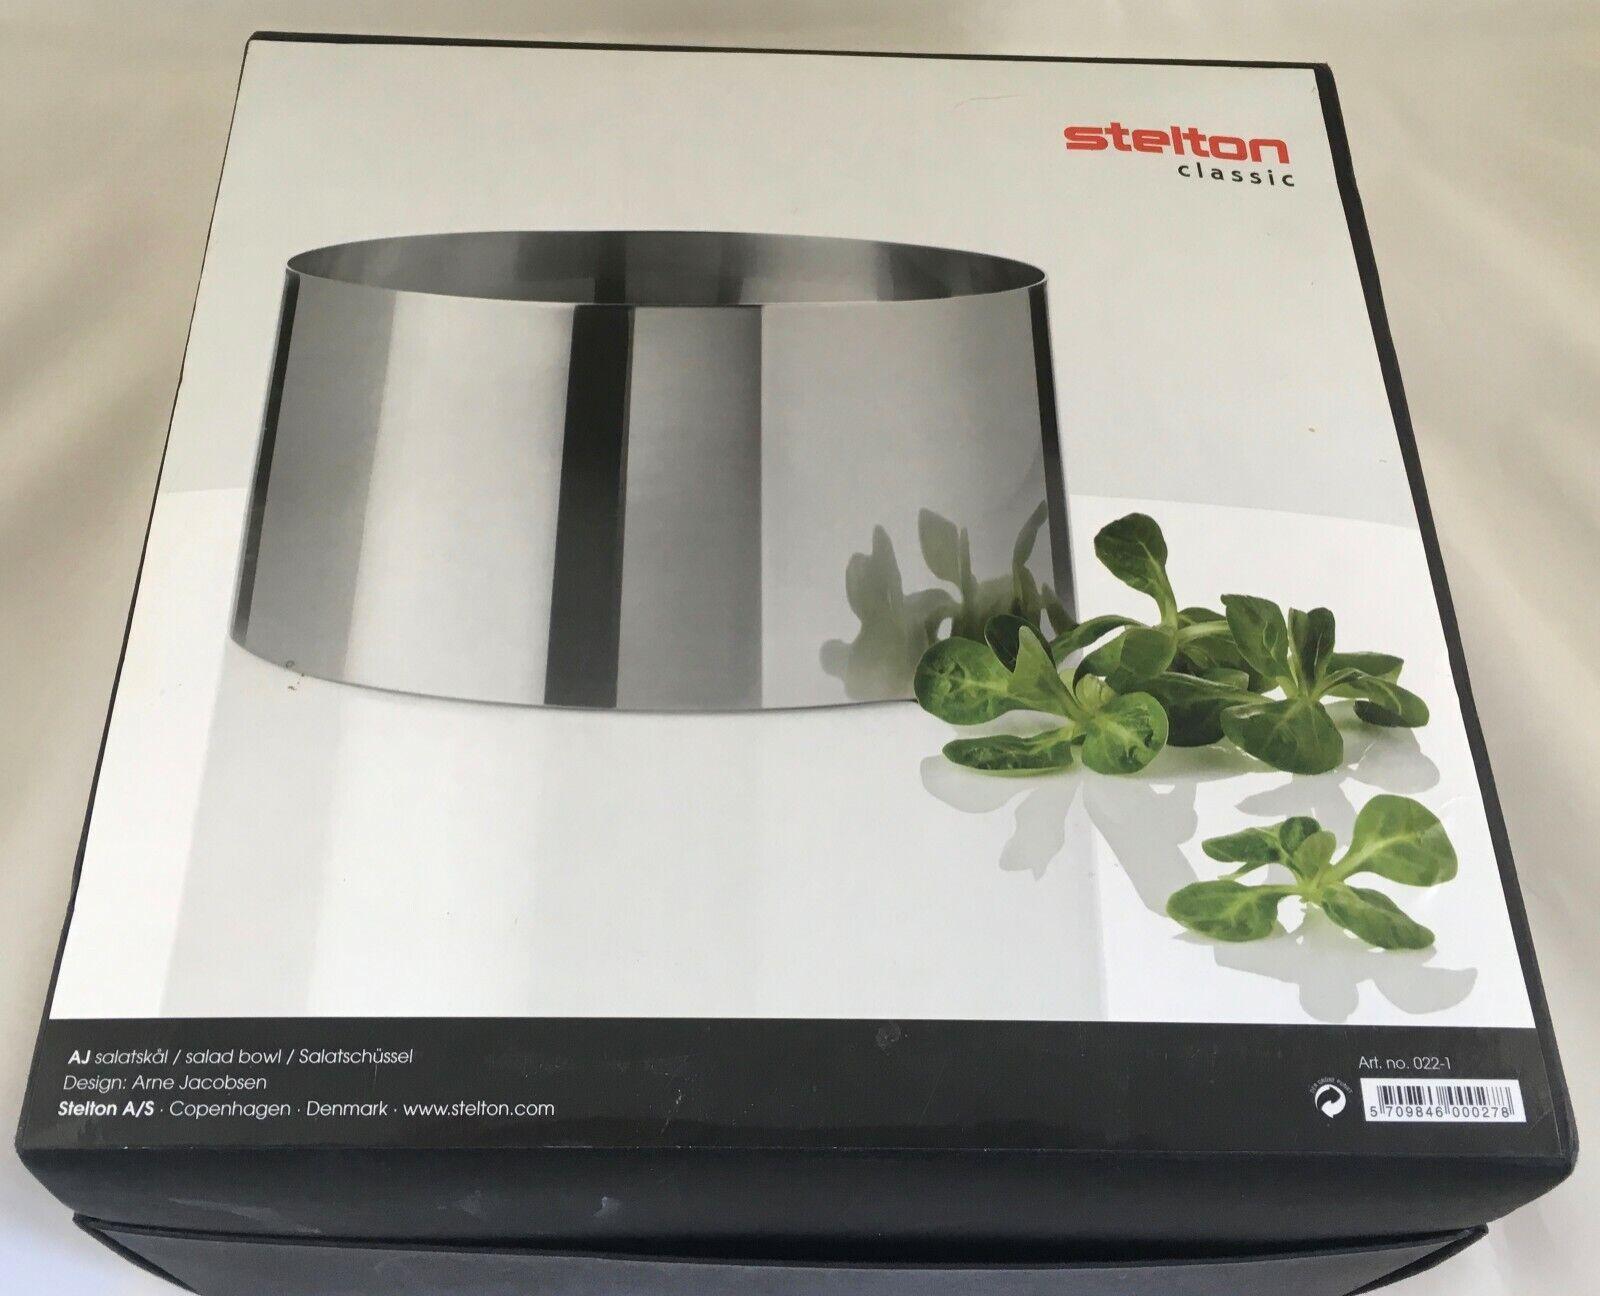 Cylinda-ligne par Arne Jacobsen pour STELTON Saladier NEW IN BOX